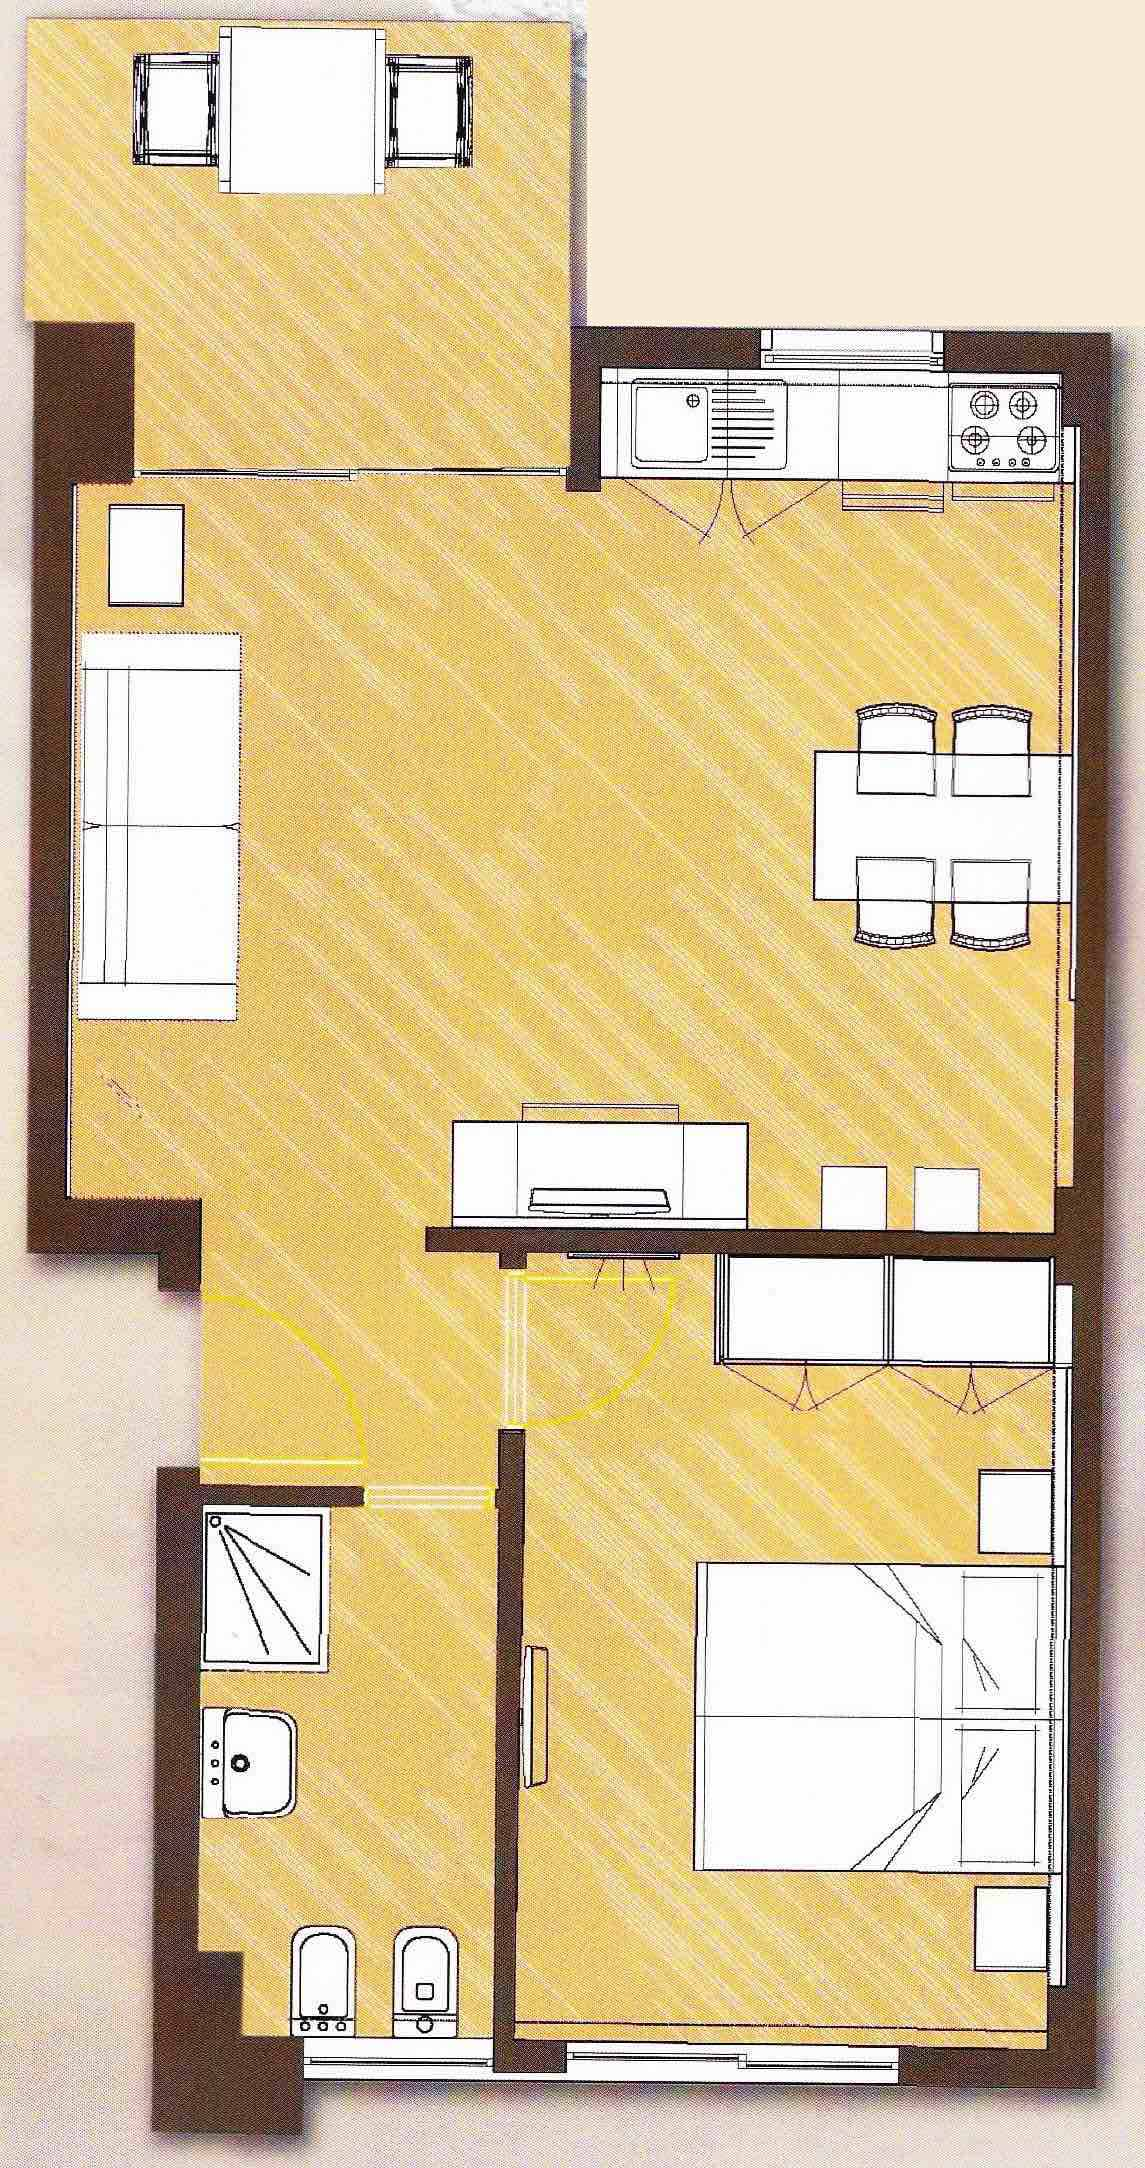 Apatment - B floor plan